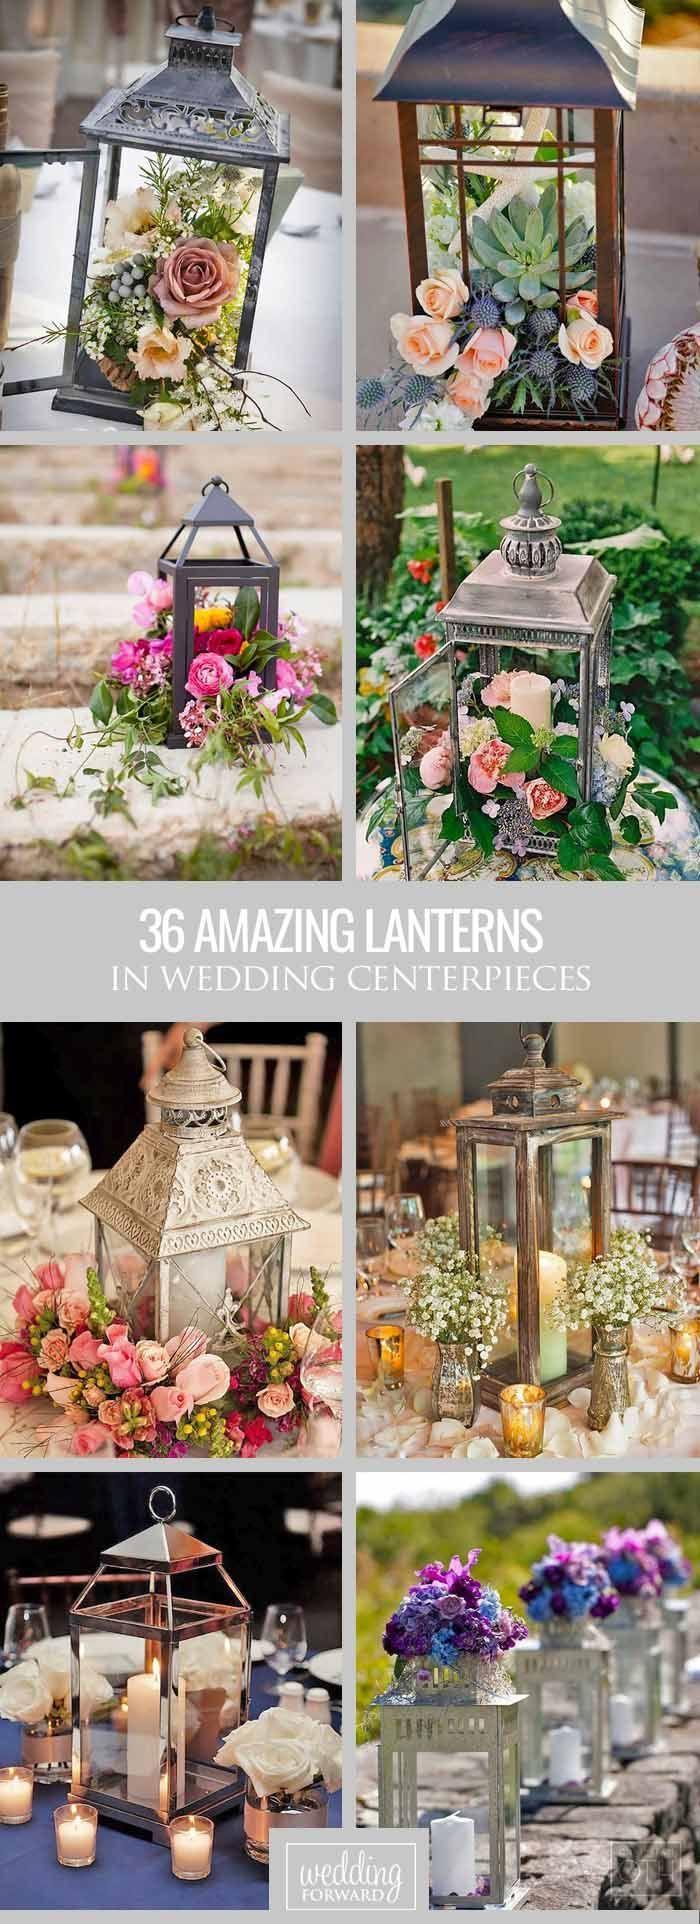 36 Amazing Lantern Wedding Centerpiece Ideas ❤ We propose to consider lantern wedding centerpiece ideas with candles or beautiful flowers inside. See more: www.weddingforwar... #weddings #decoration